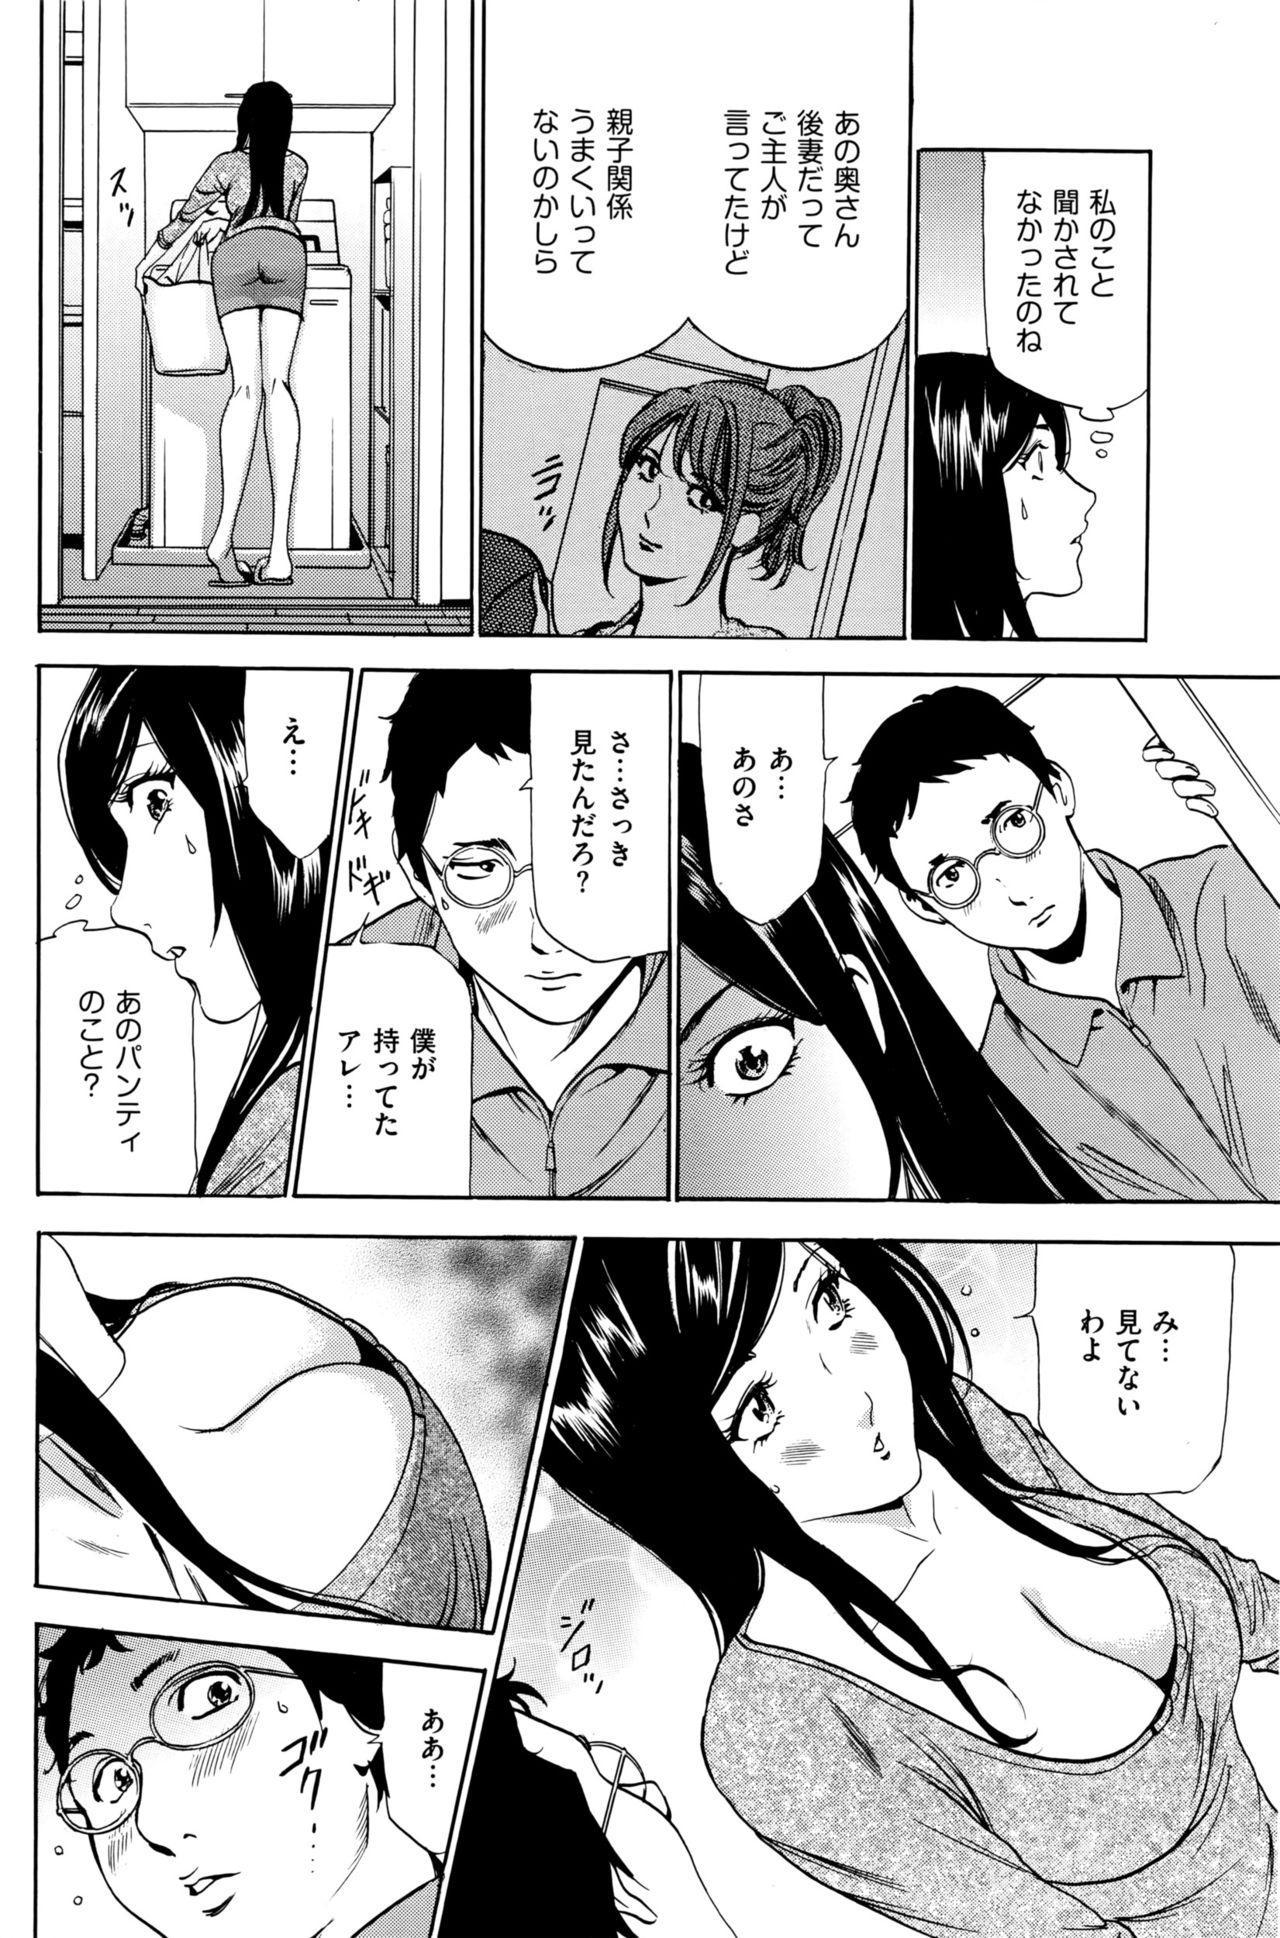 Wa Usuki Ipa a 1-10 24